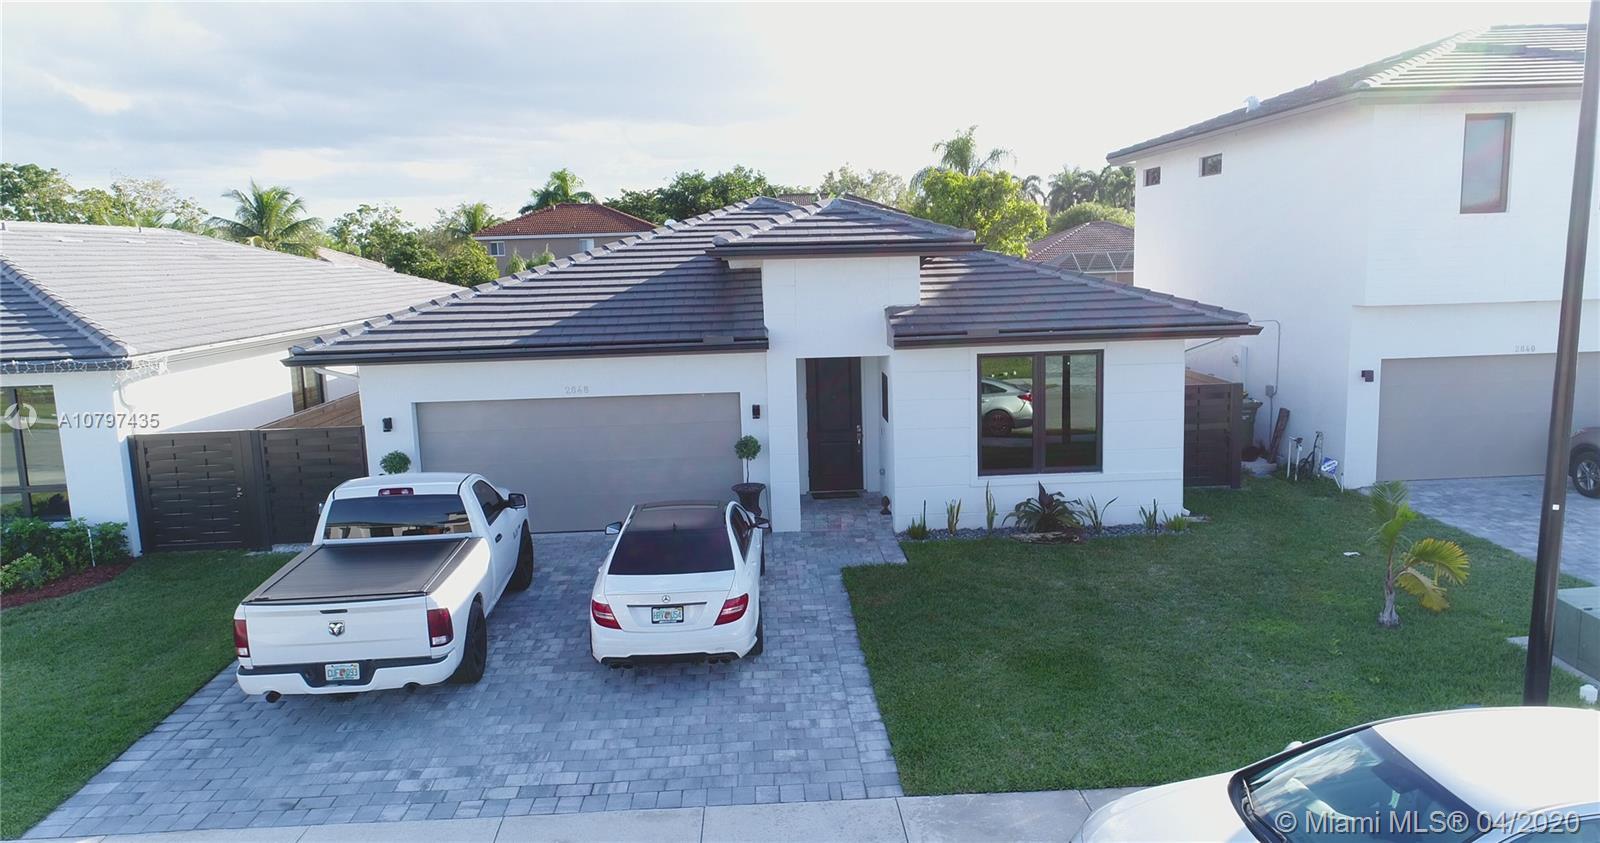 2848 SE 3rd ST, Homestead, FL 33033 - Homestead, FL real estate listing